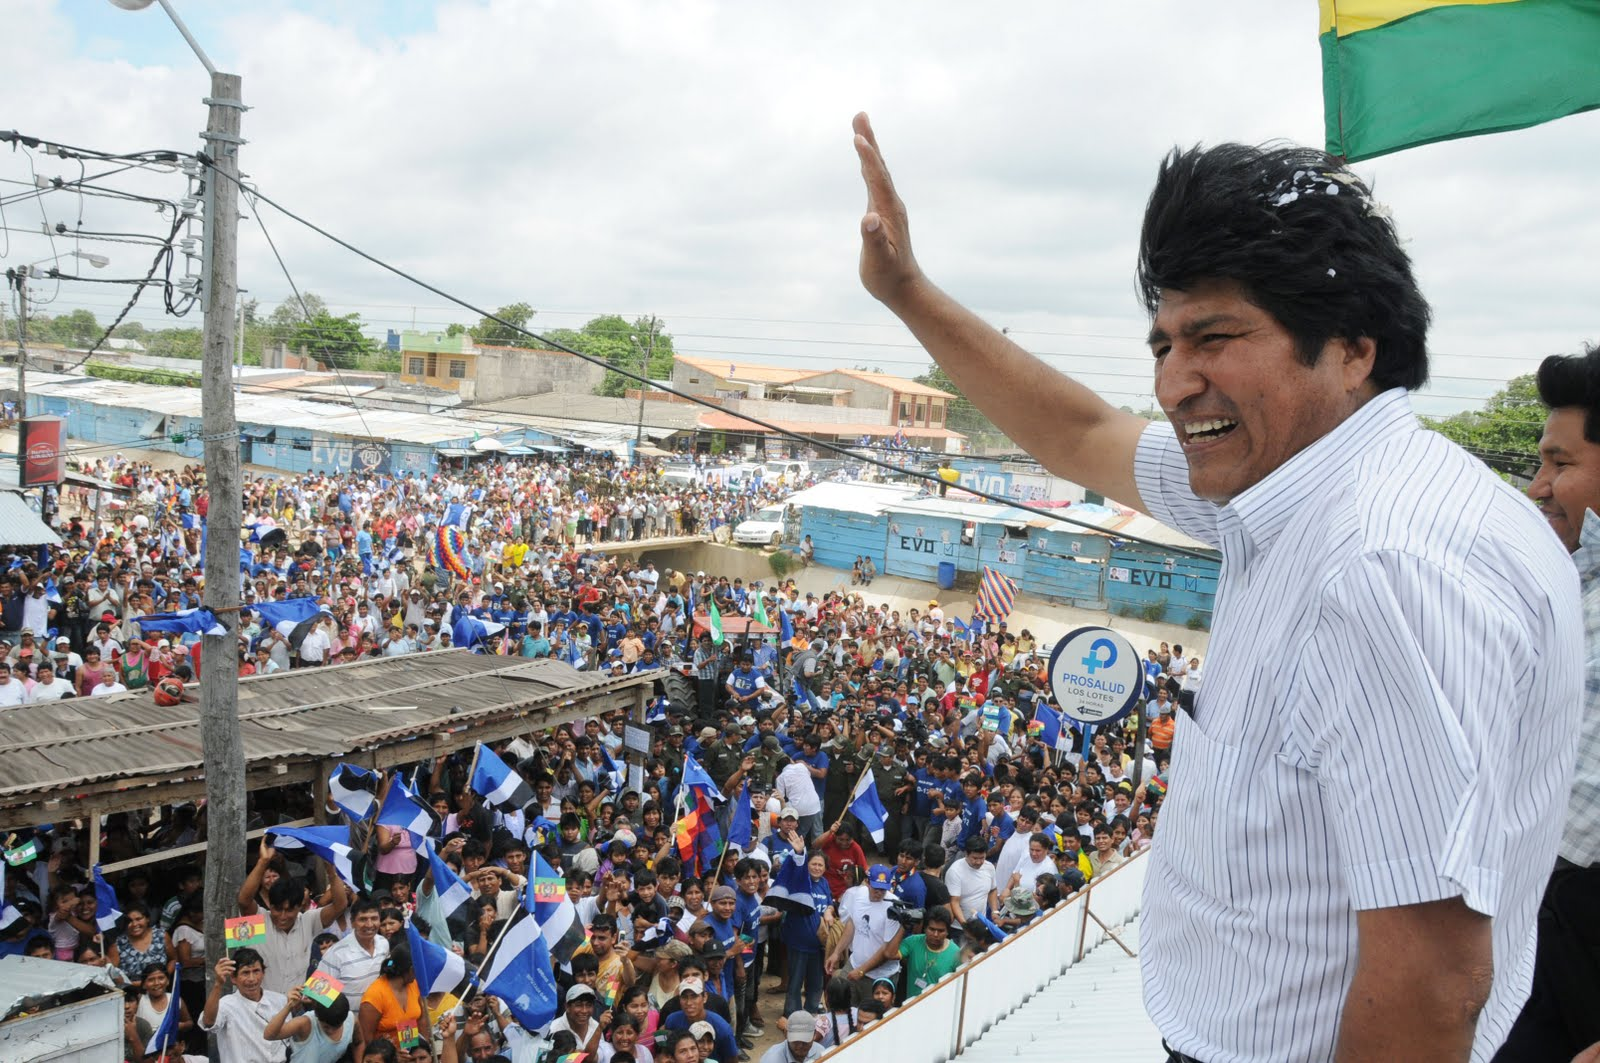 Media and Democracy in Bolivia